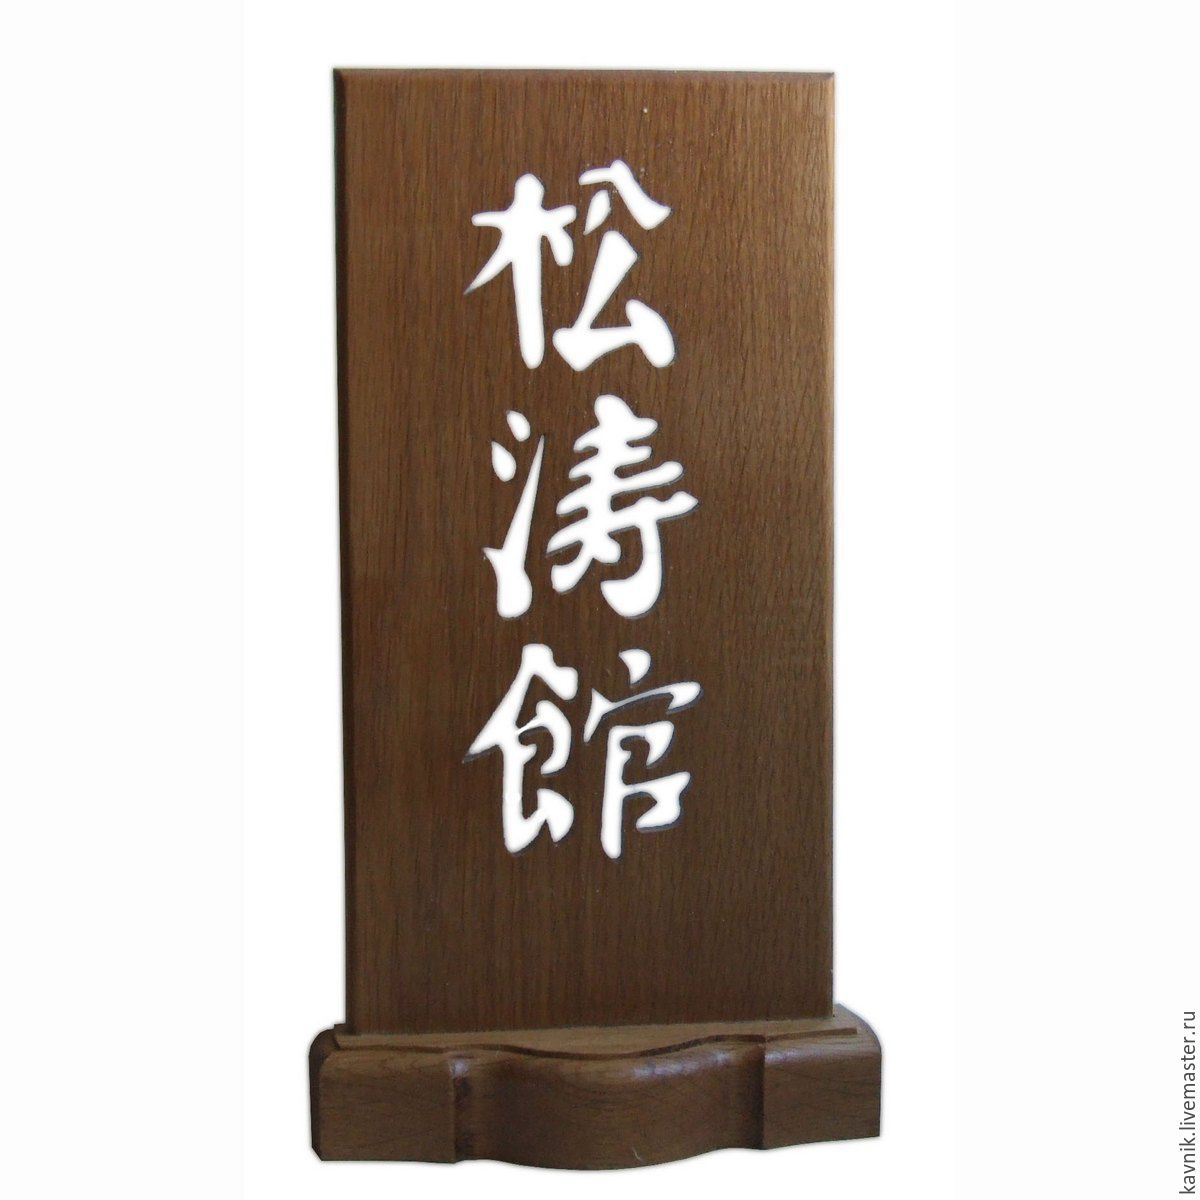 Табличка с иероглифом СЕТОКАН | Дуб, Дзюдо, Джиу джитсу